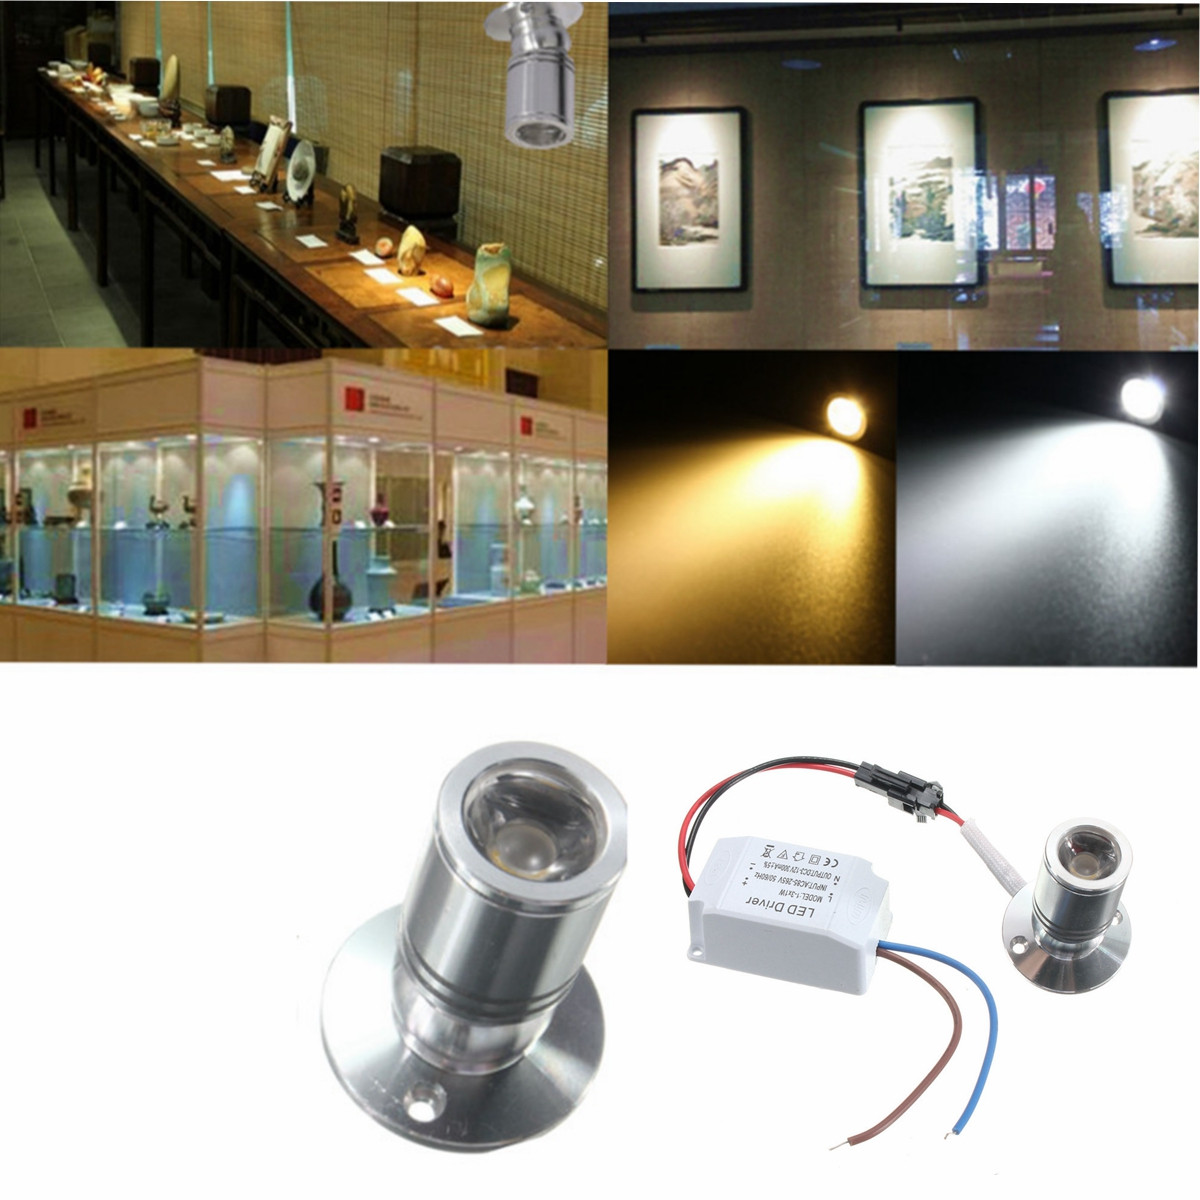 1W Mini Jewelry Light Cabinet Lamp Aluminum Ceiling LED Spotlight Light Flood Lamp With Driver white Warm White AC85-265V